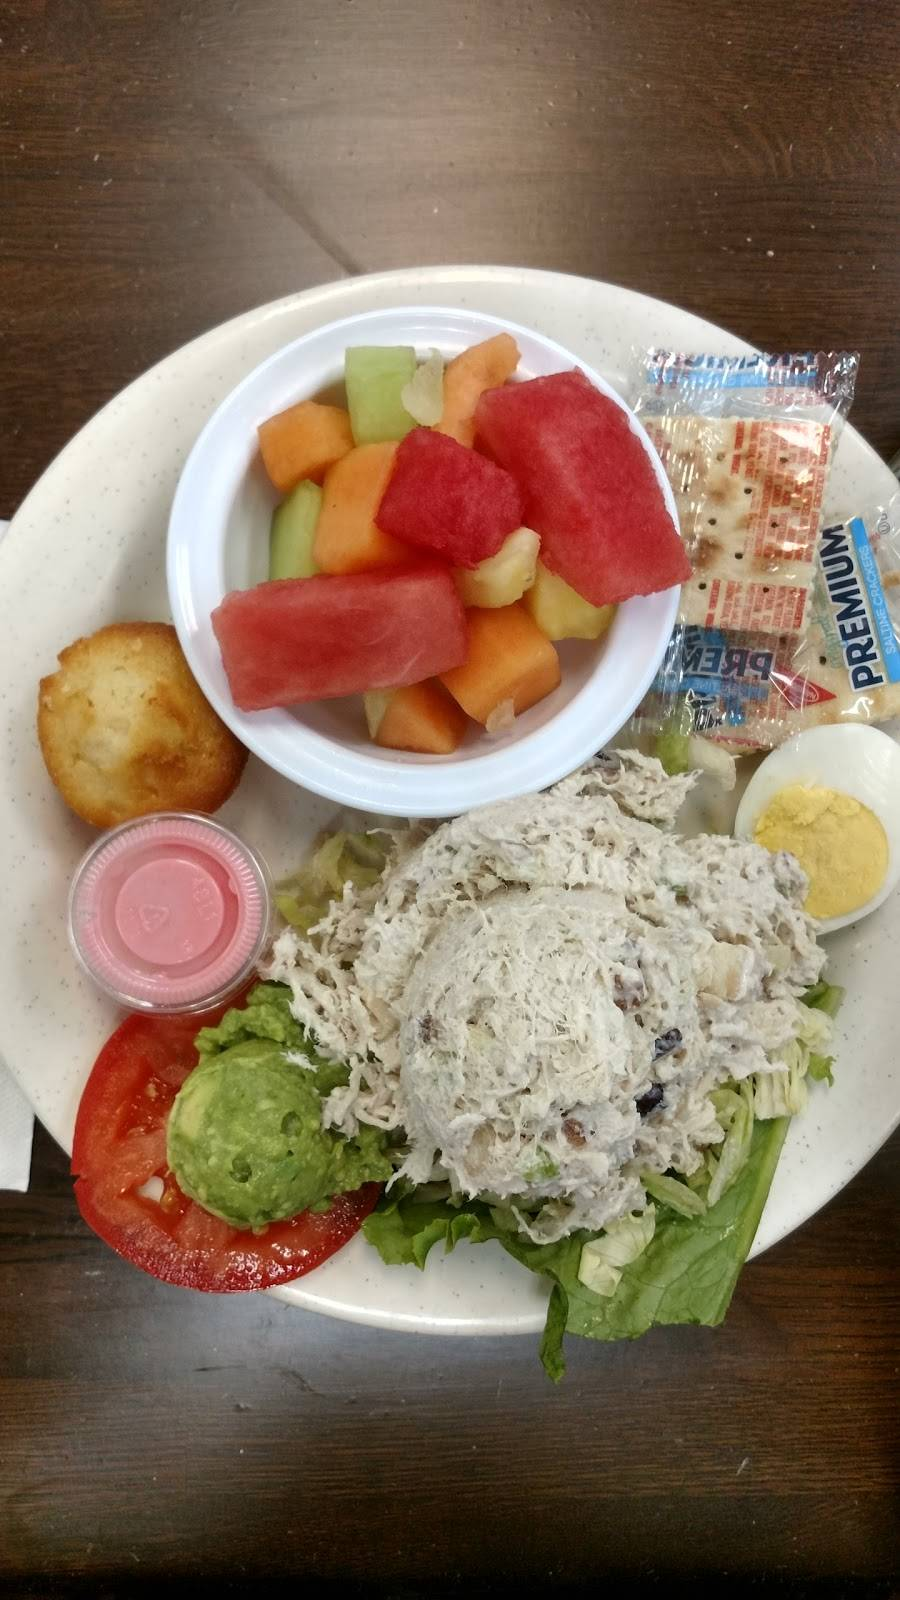 Patio Cafe & Bakery | cafe | 5950 State Bridge Rd G, Duluth, GA 30097, USA | 7704189300 OR +1 770-418-9300